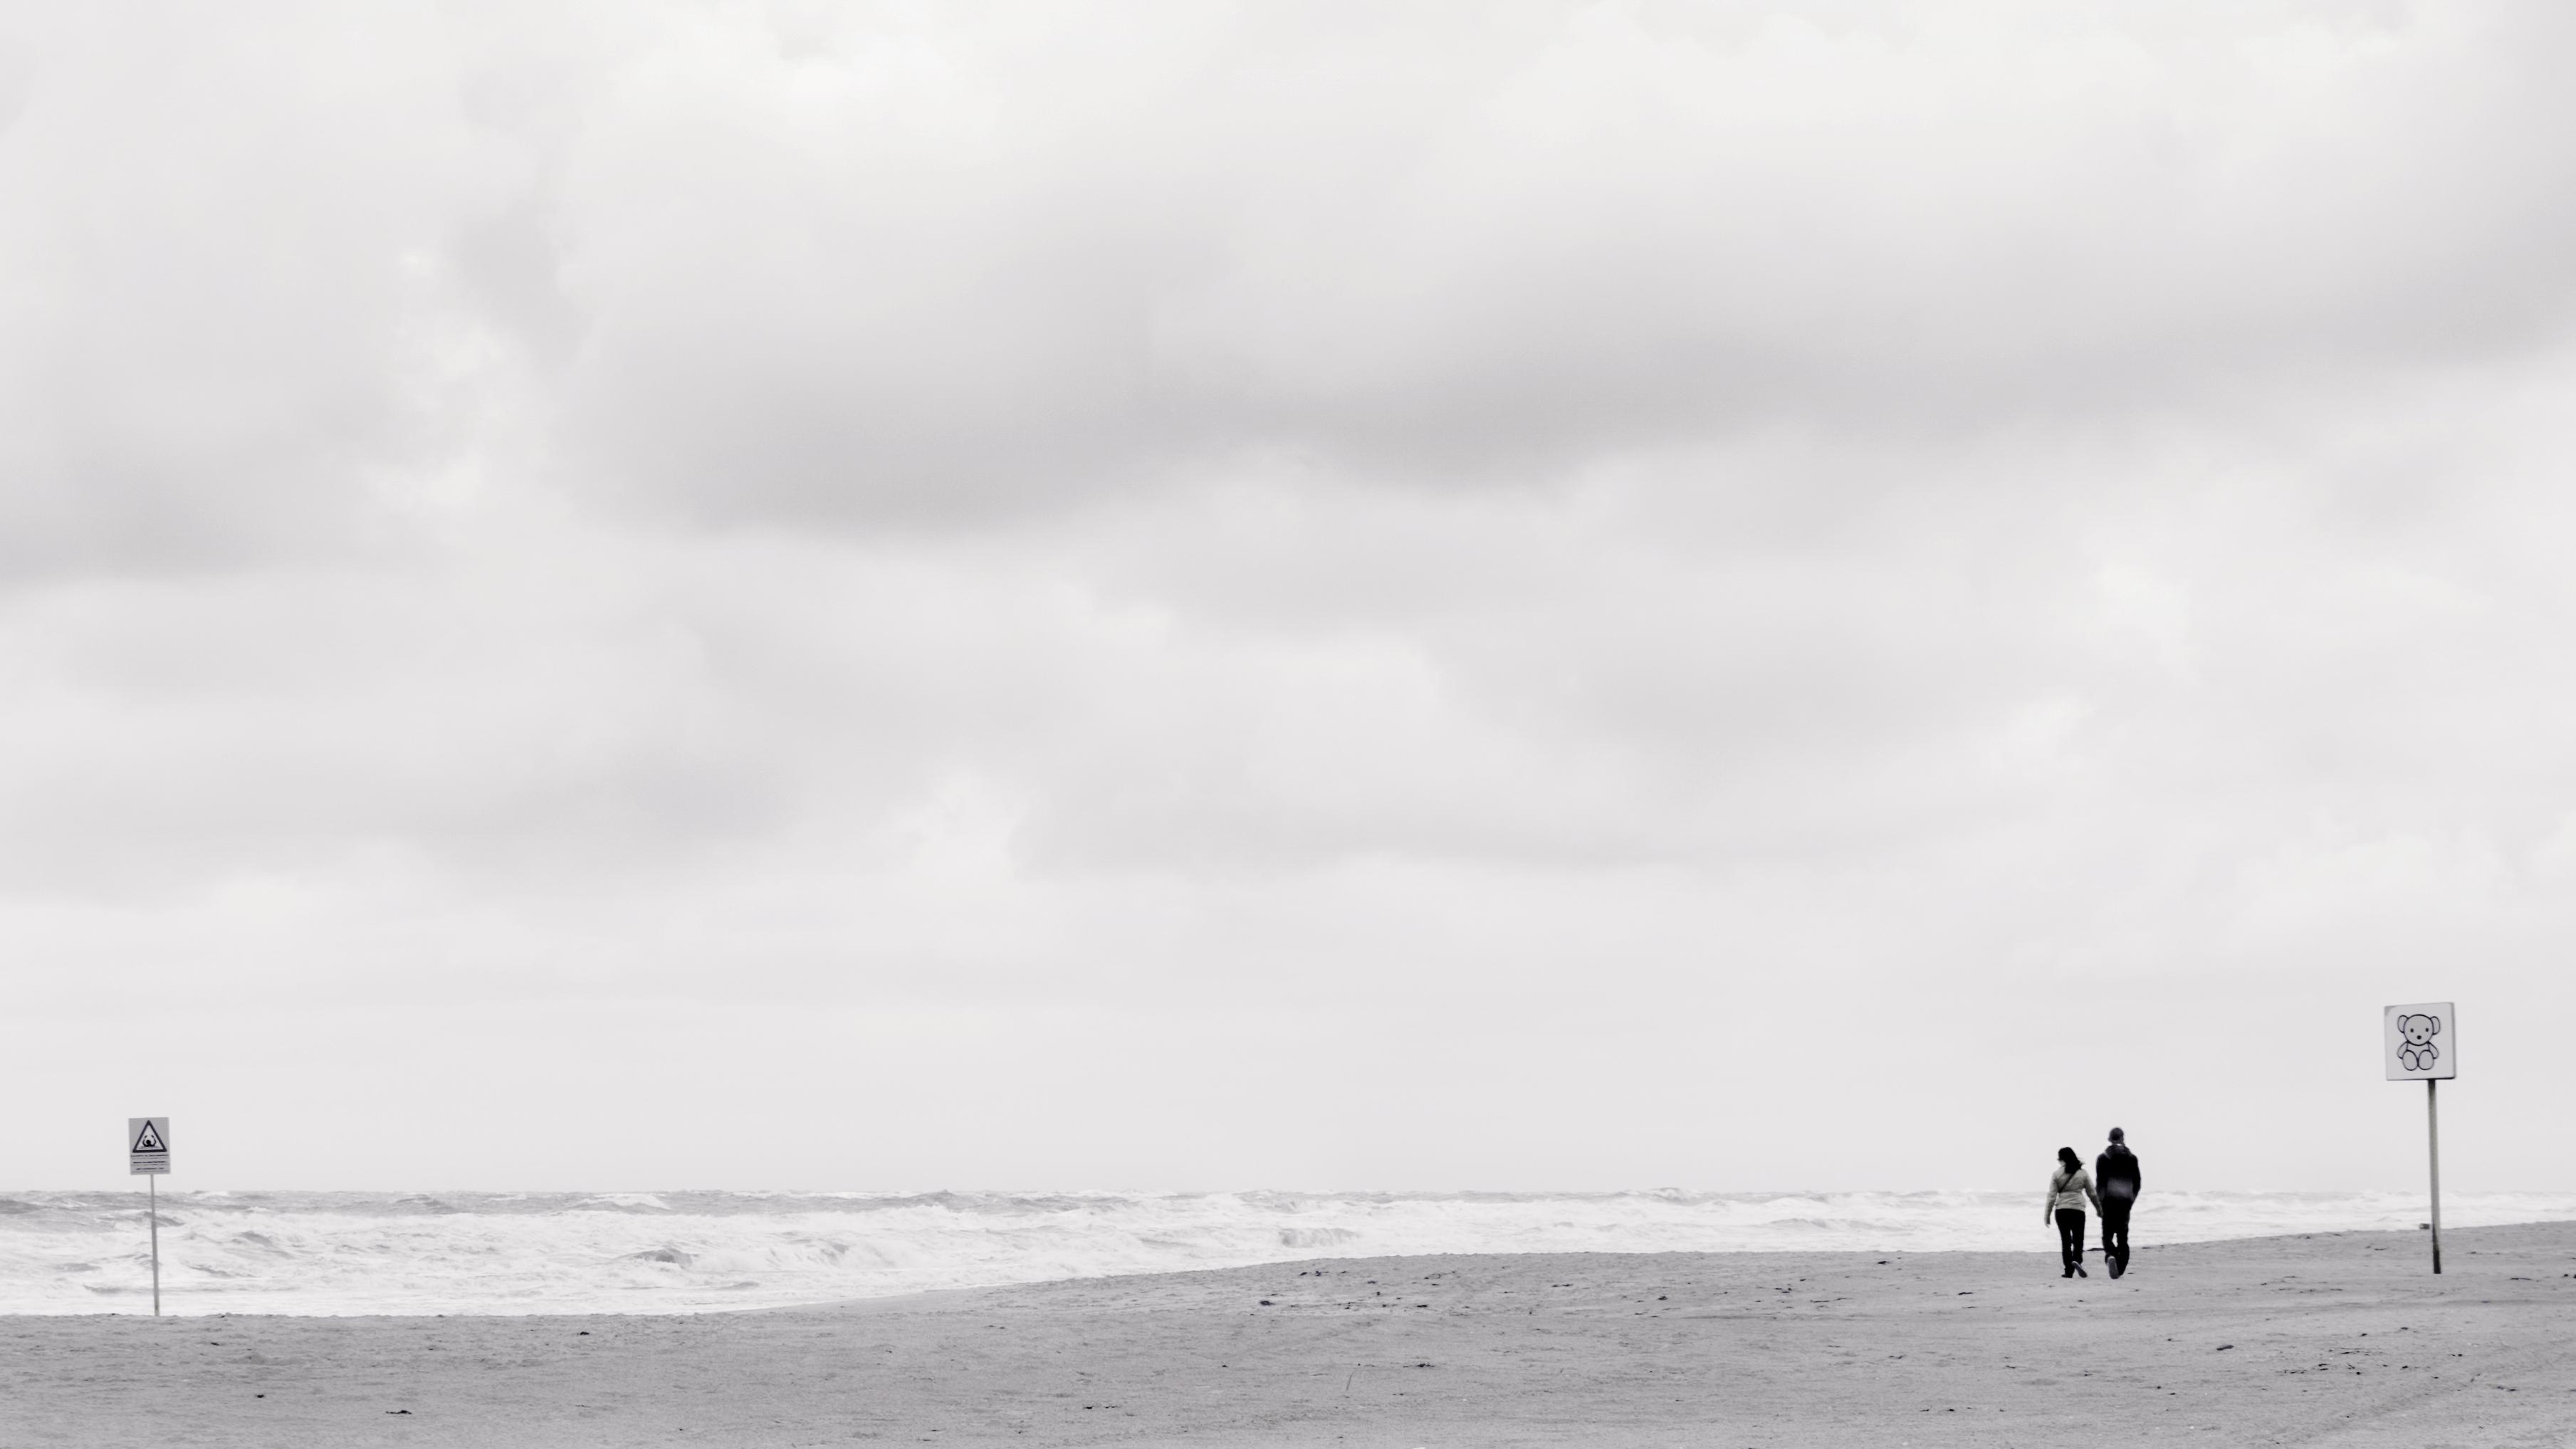 Strandspaziergang01